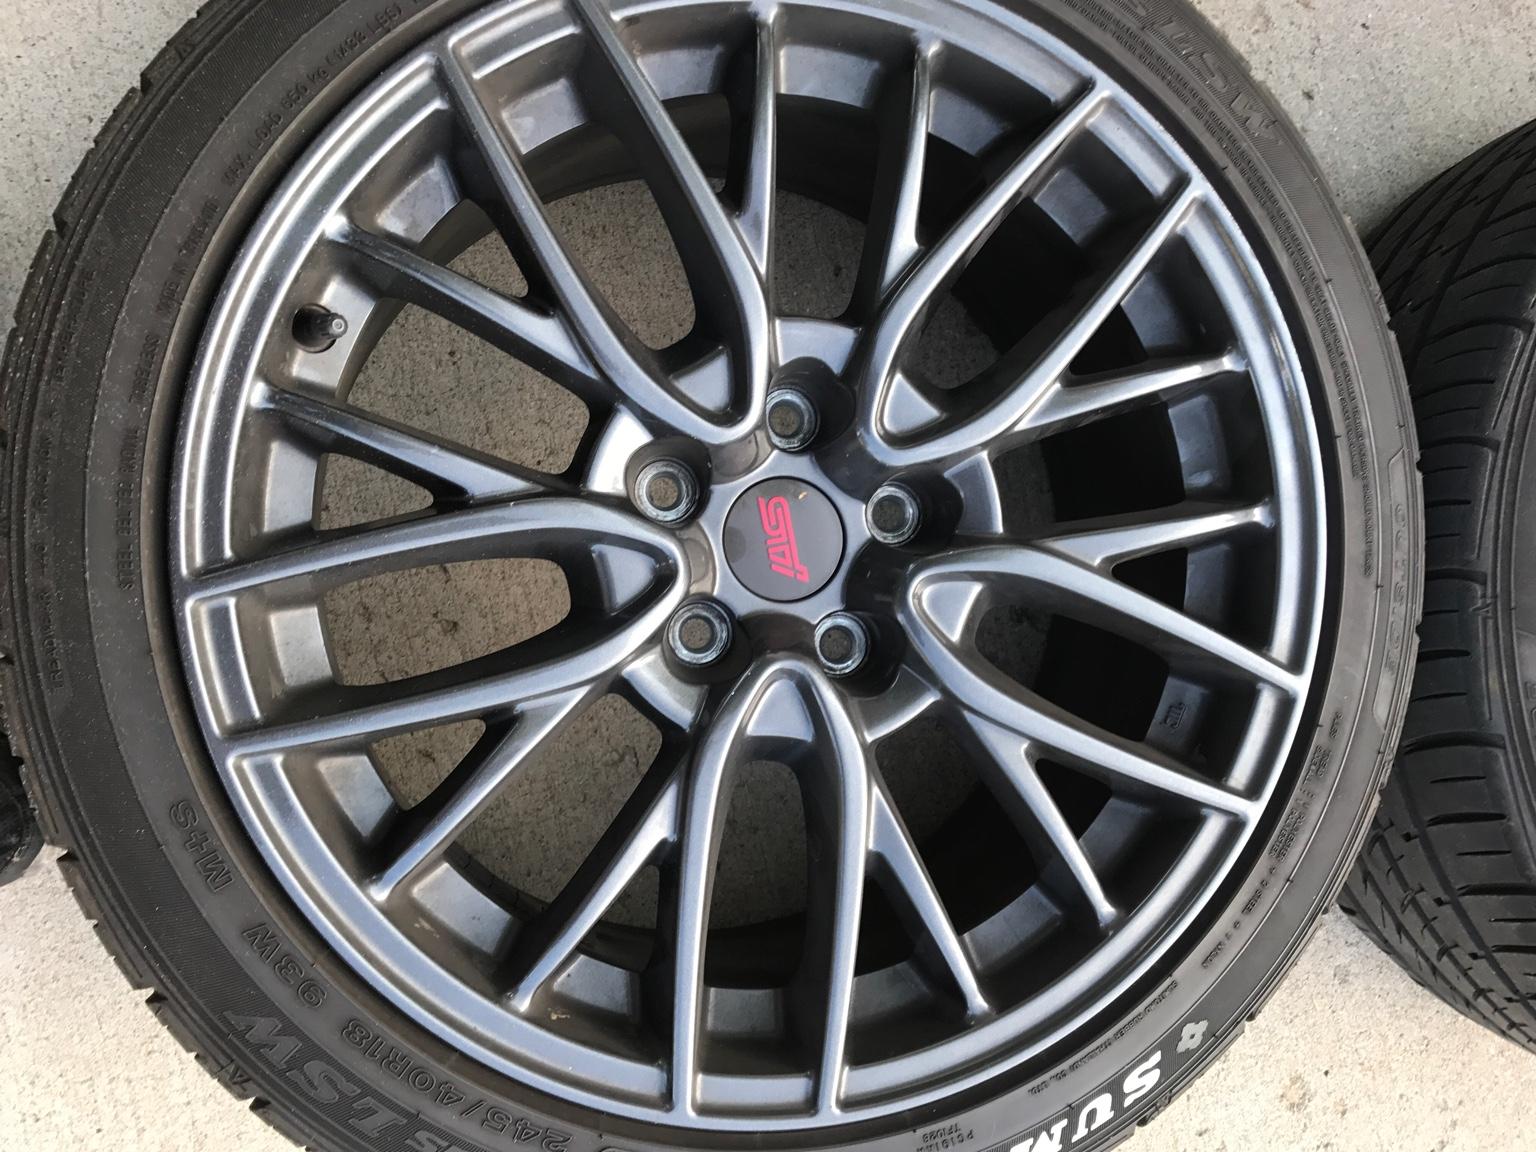 fs for sale 2016 sti enkei wheels and tires nasioc. Black Bedroom Furniture Sets. Home Design Ideas